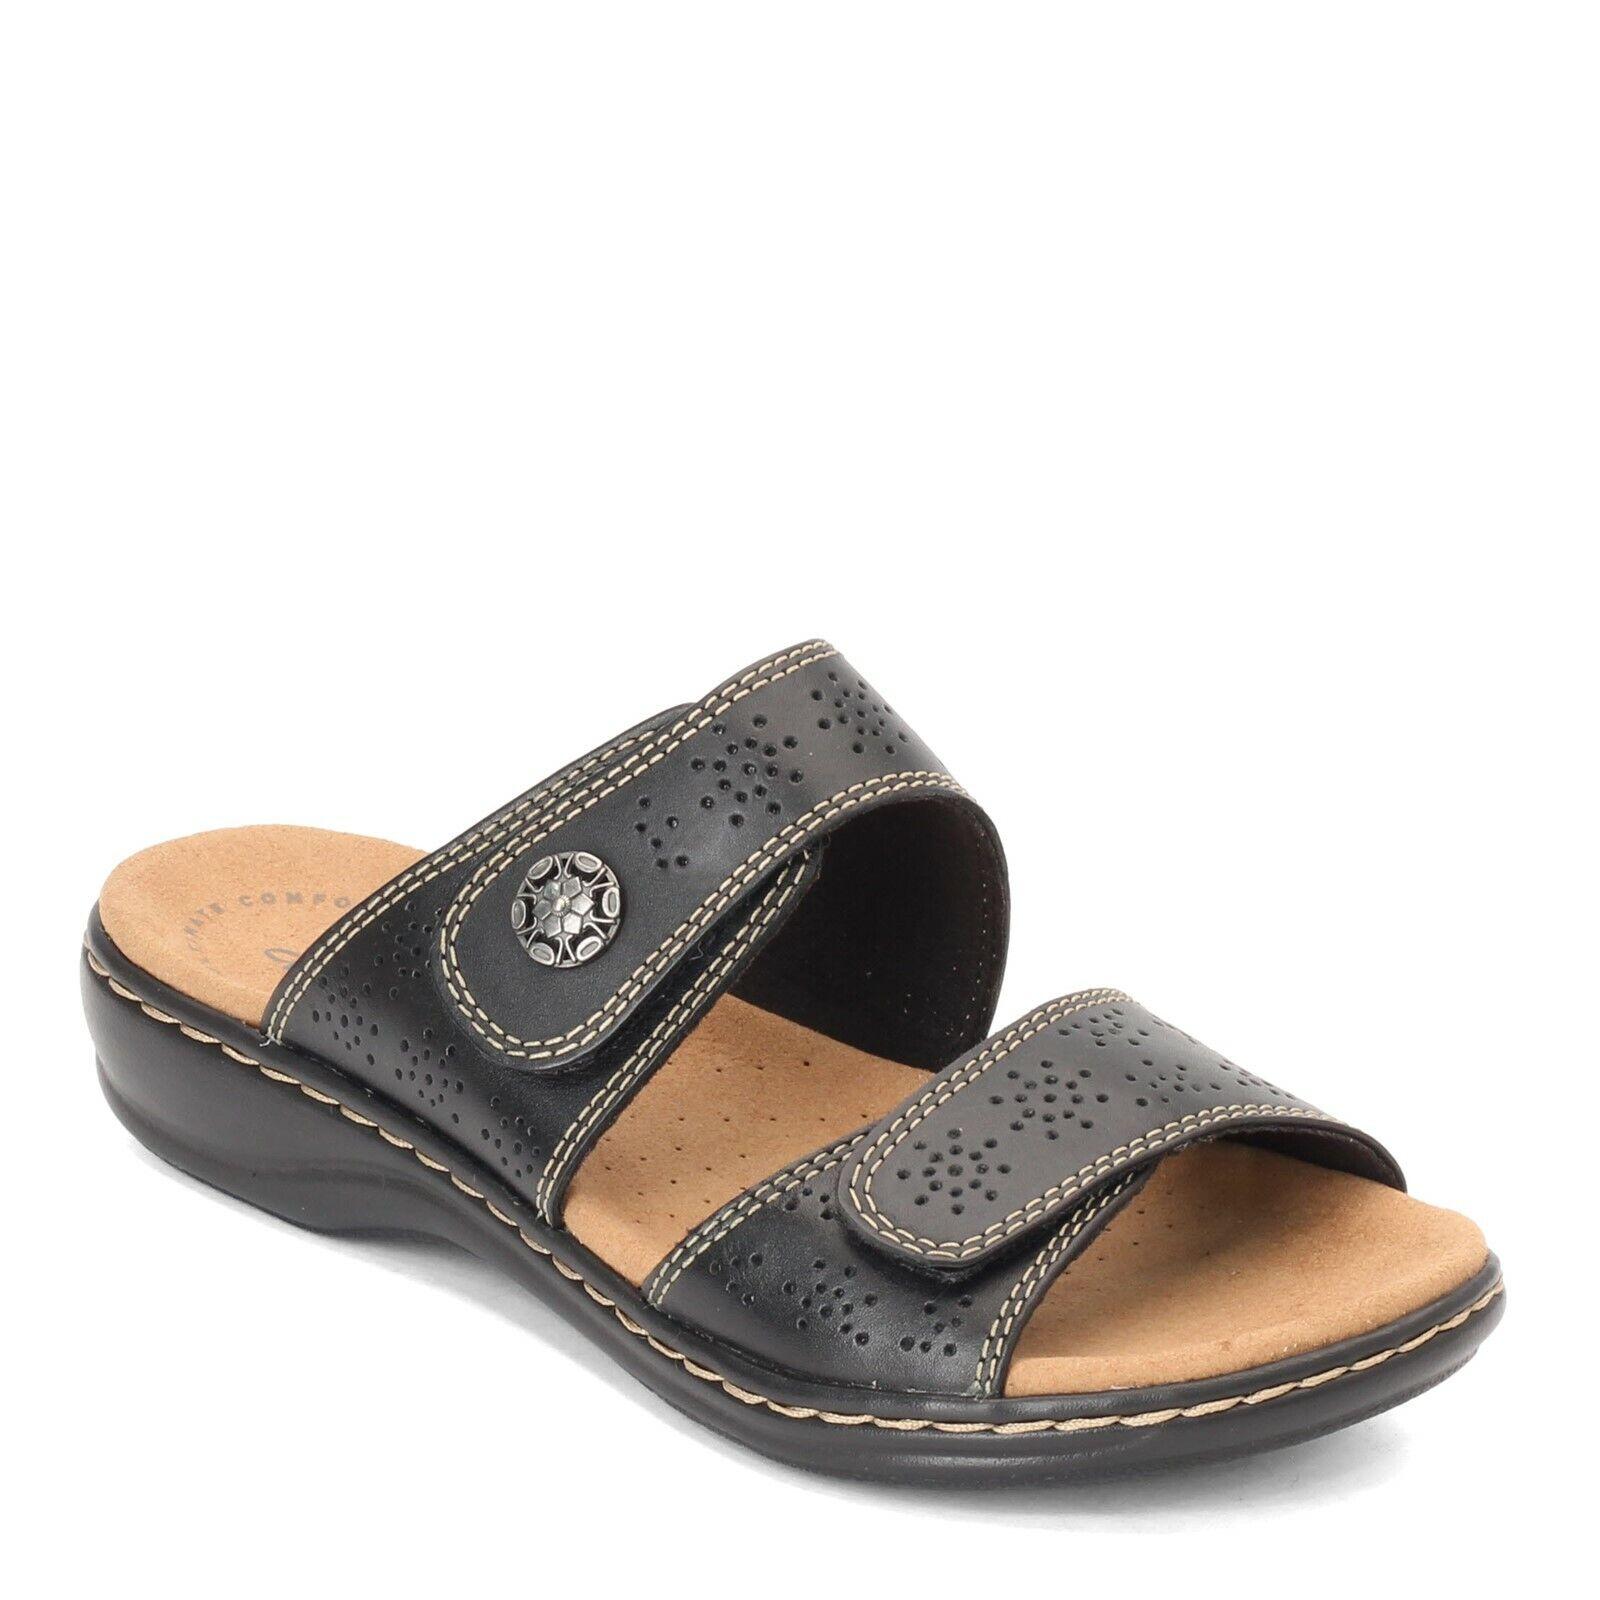 Clarks, Leisa Lacole Slide Sandals